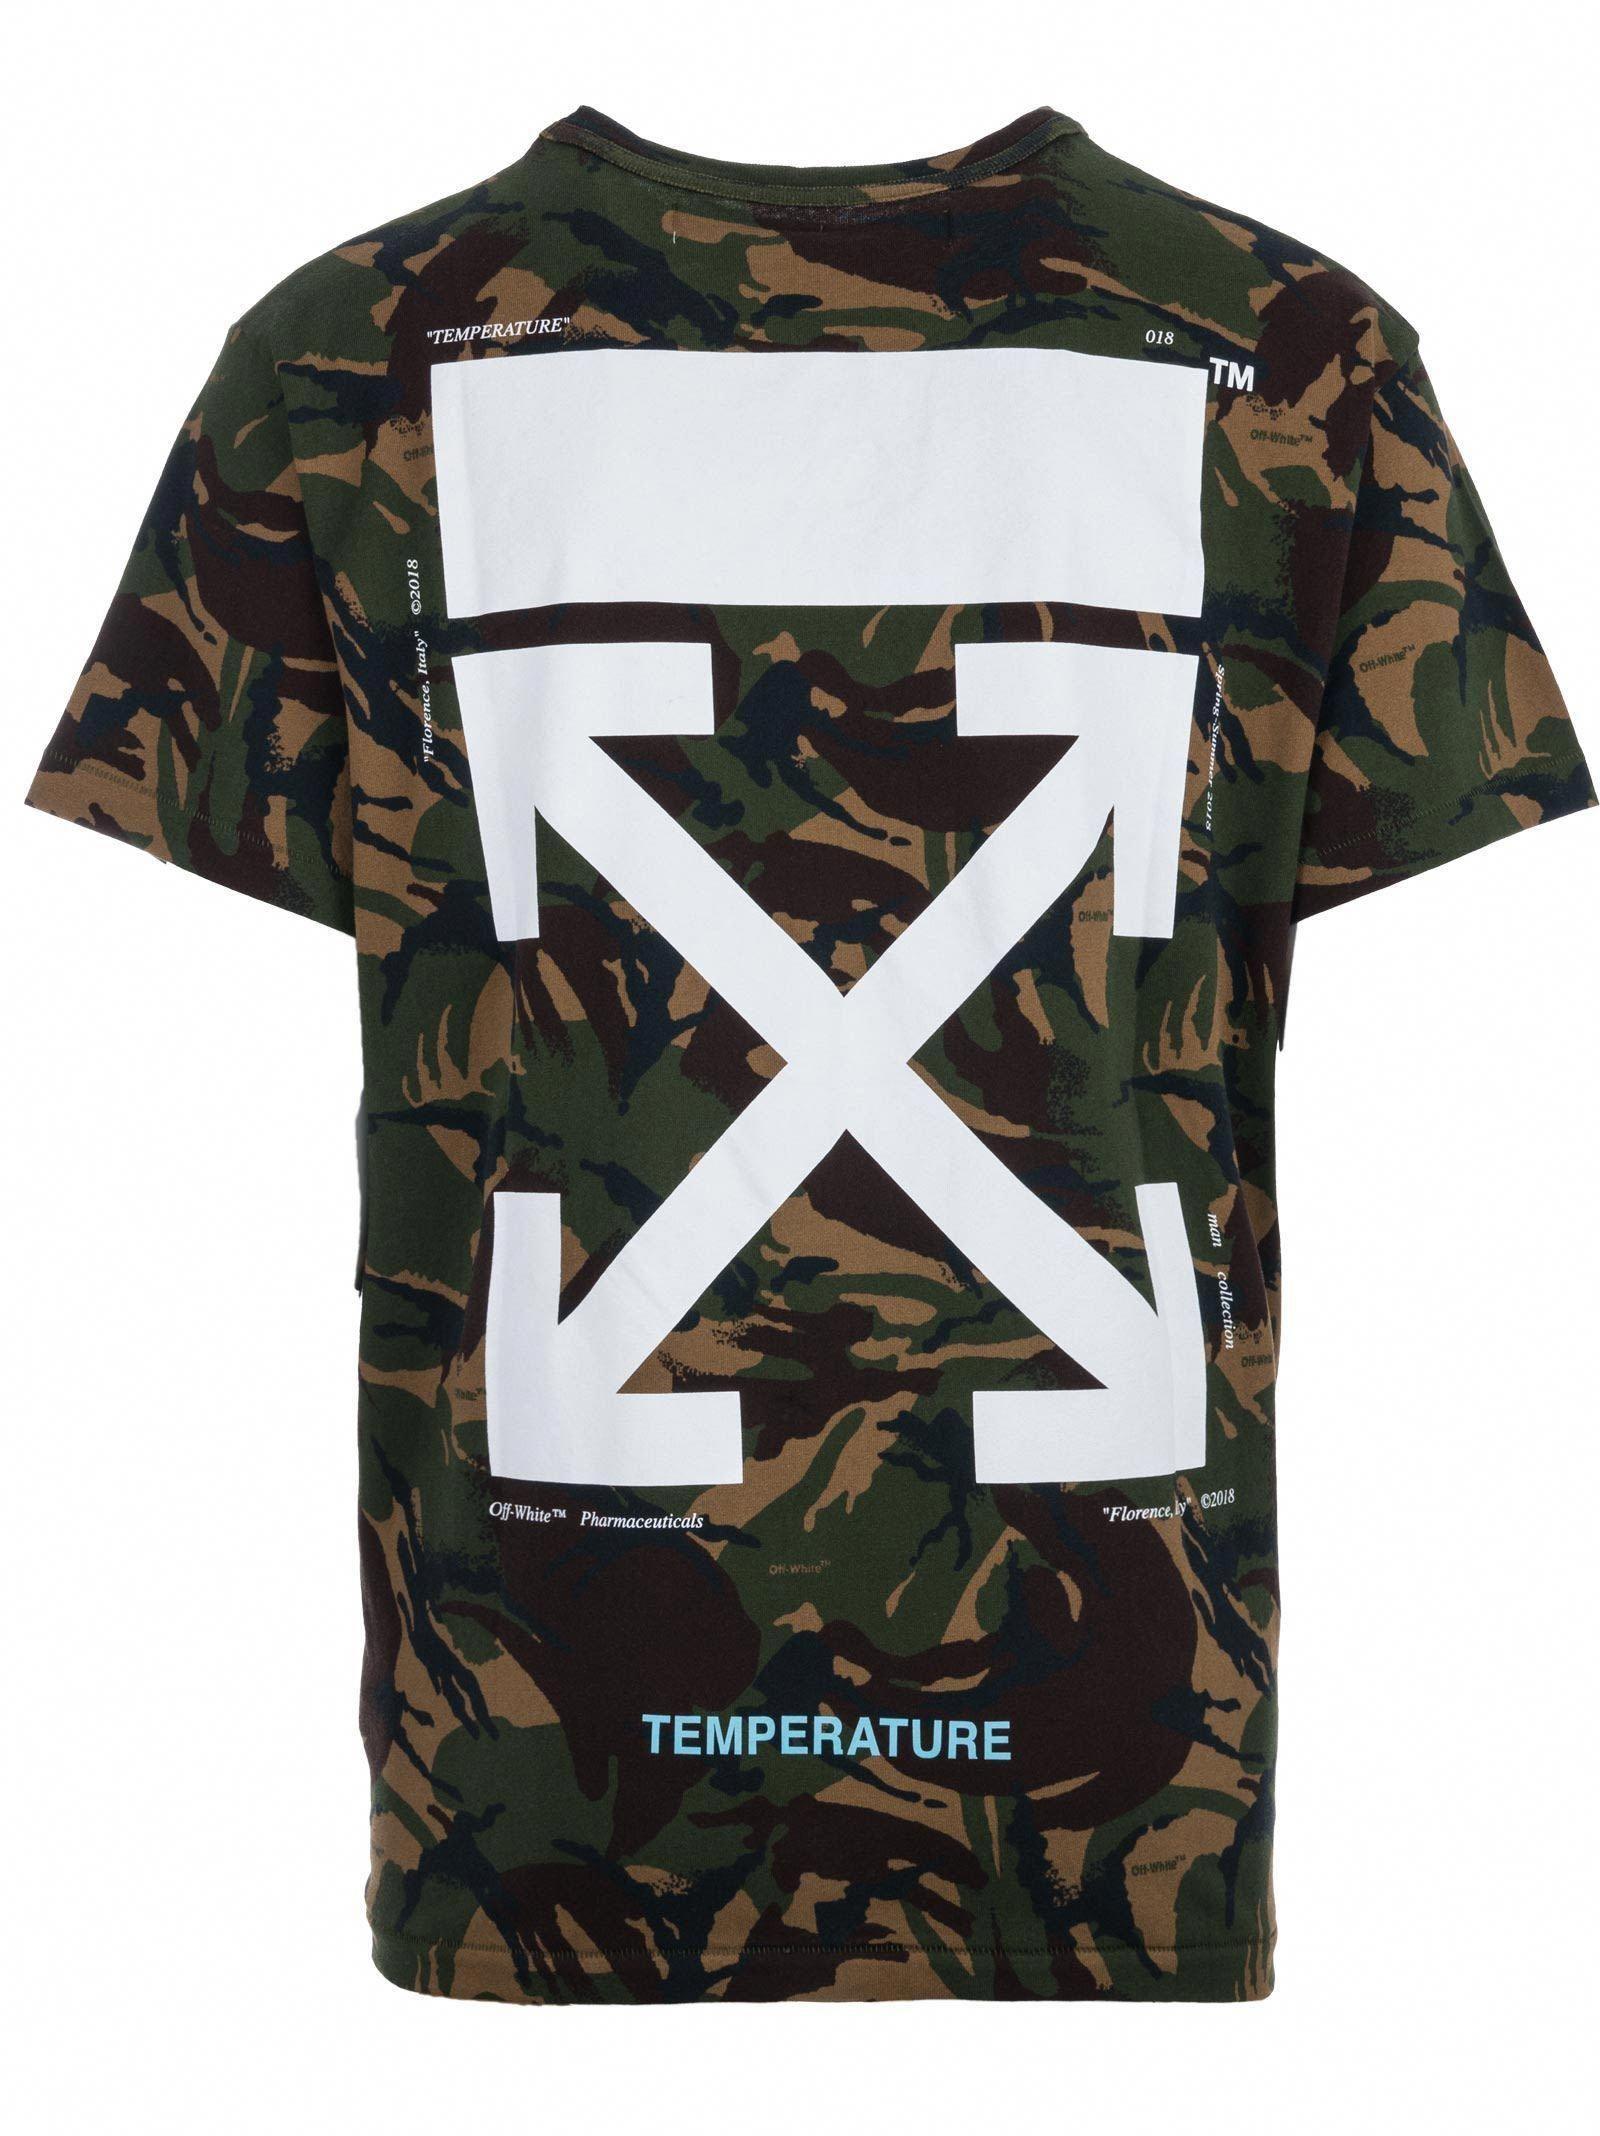 Alert Tiger Print Animal Fashion Brand Purpose Tour Homme 3d T-shirts 2017 New Men 100% Cotton Fashion Hip Hop Kanye West T-shirt Tops & Tees